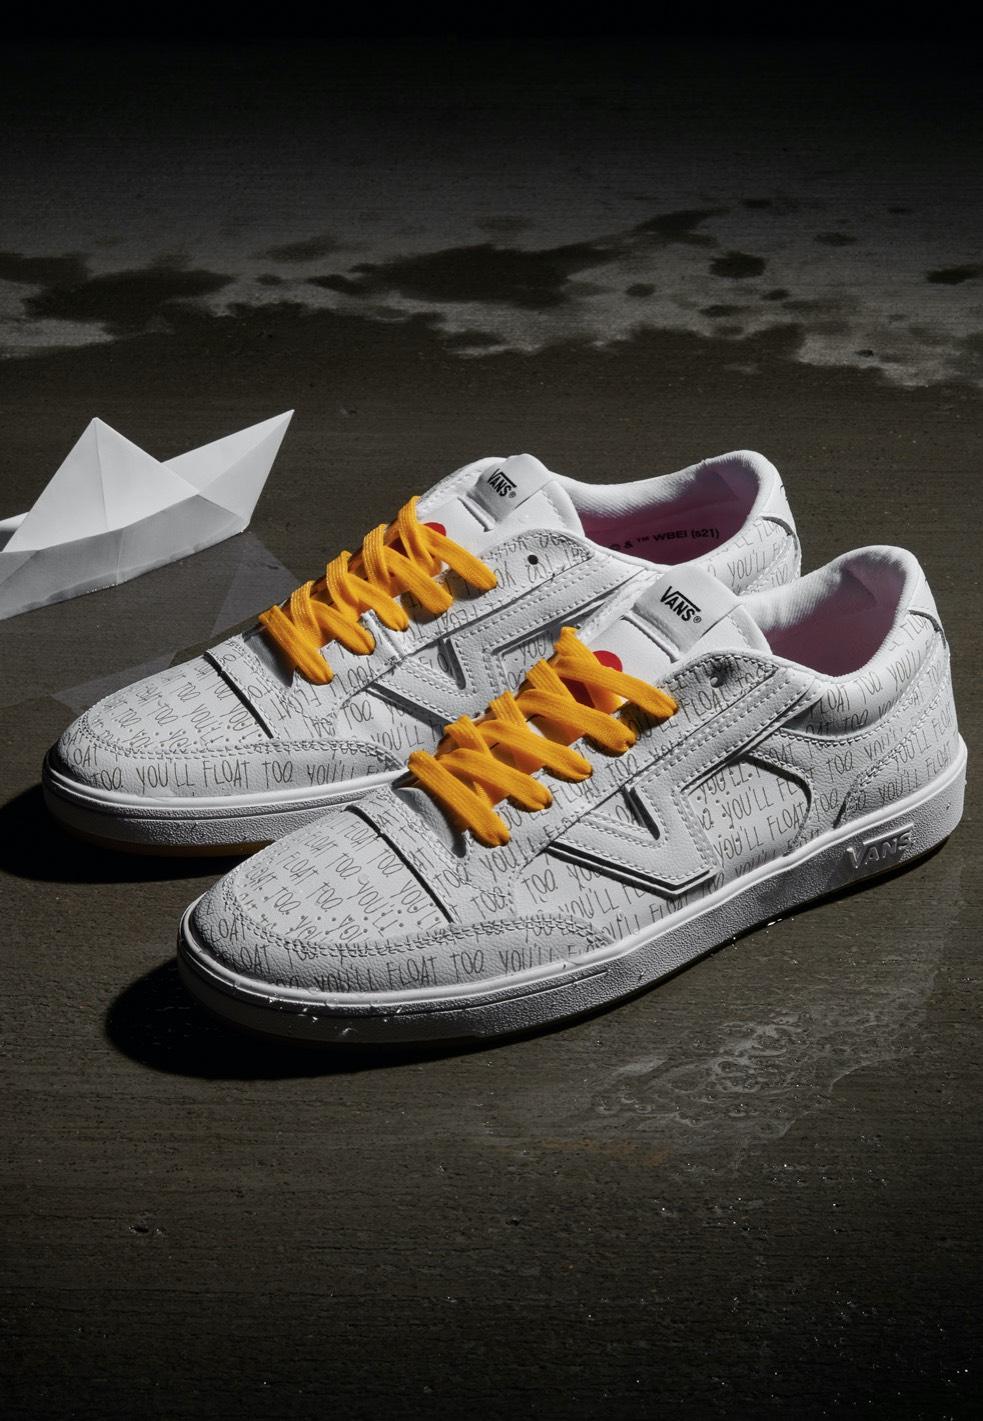 Vans x Horror Lowland CC True White/Spectra Yellow Shoes